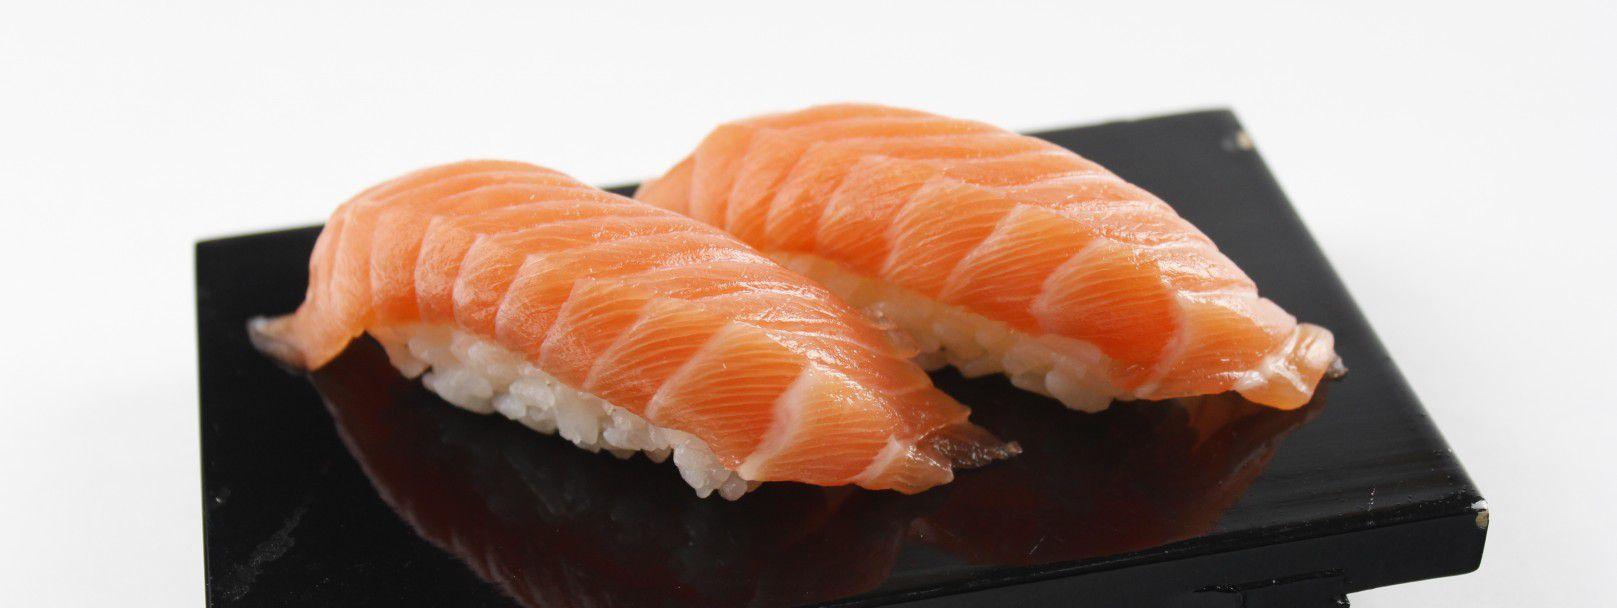 Close up of salmon nigiri on a square, black plate